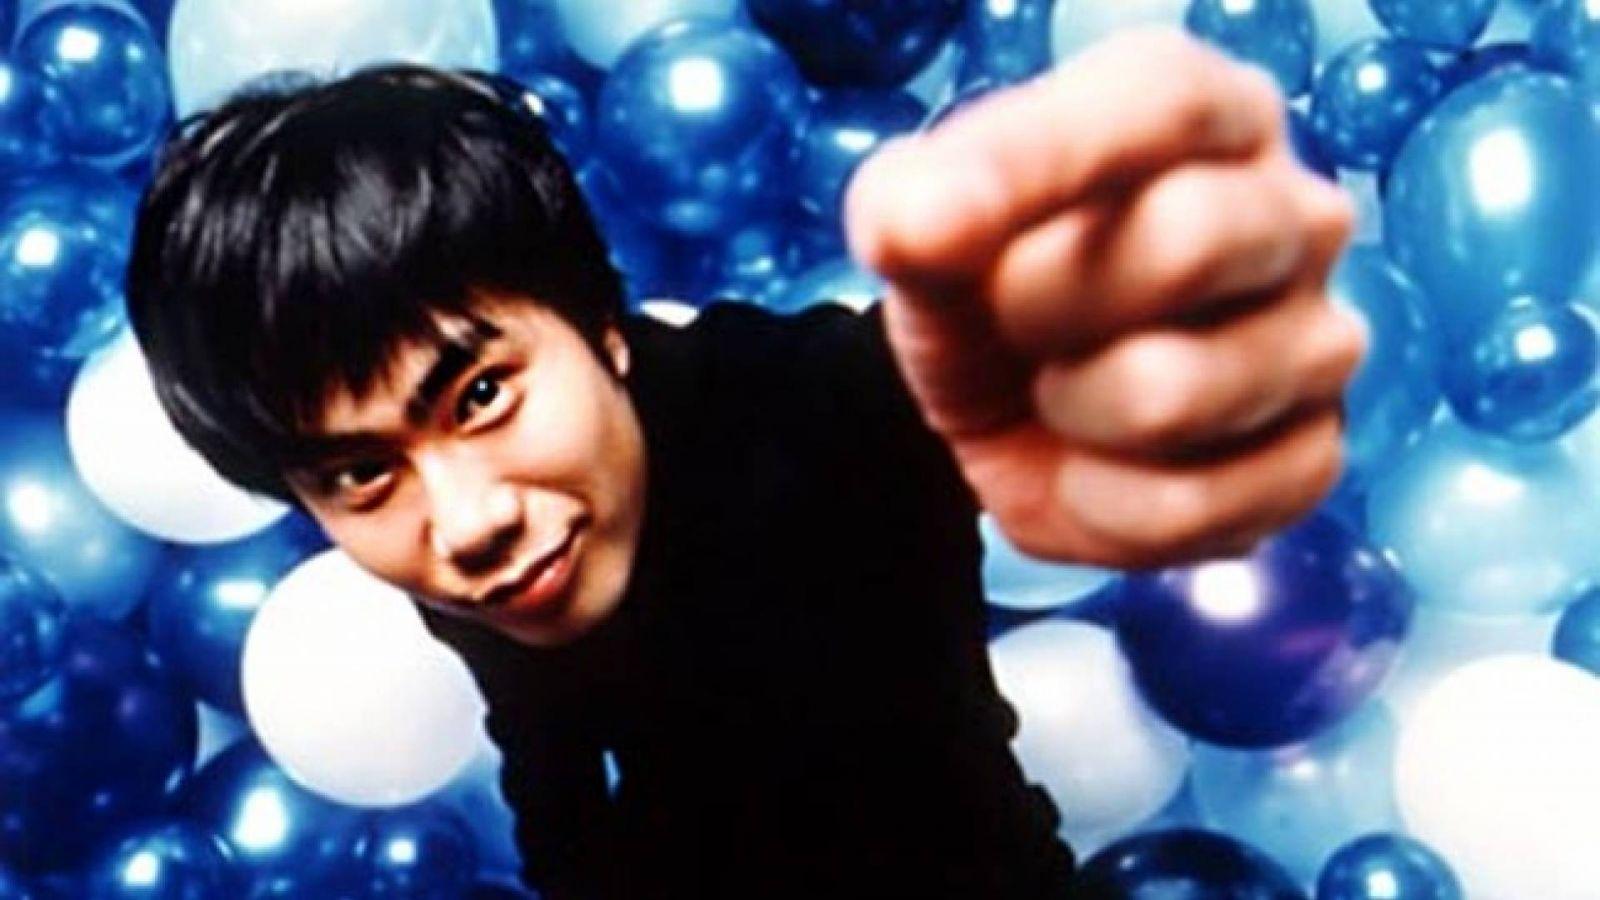 Fujii Takashi © Sony Music Entertainment (Japan) Inc.